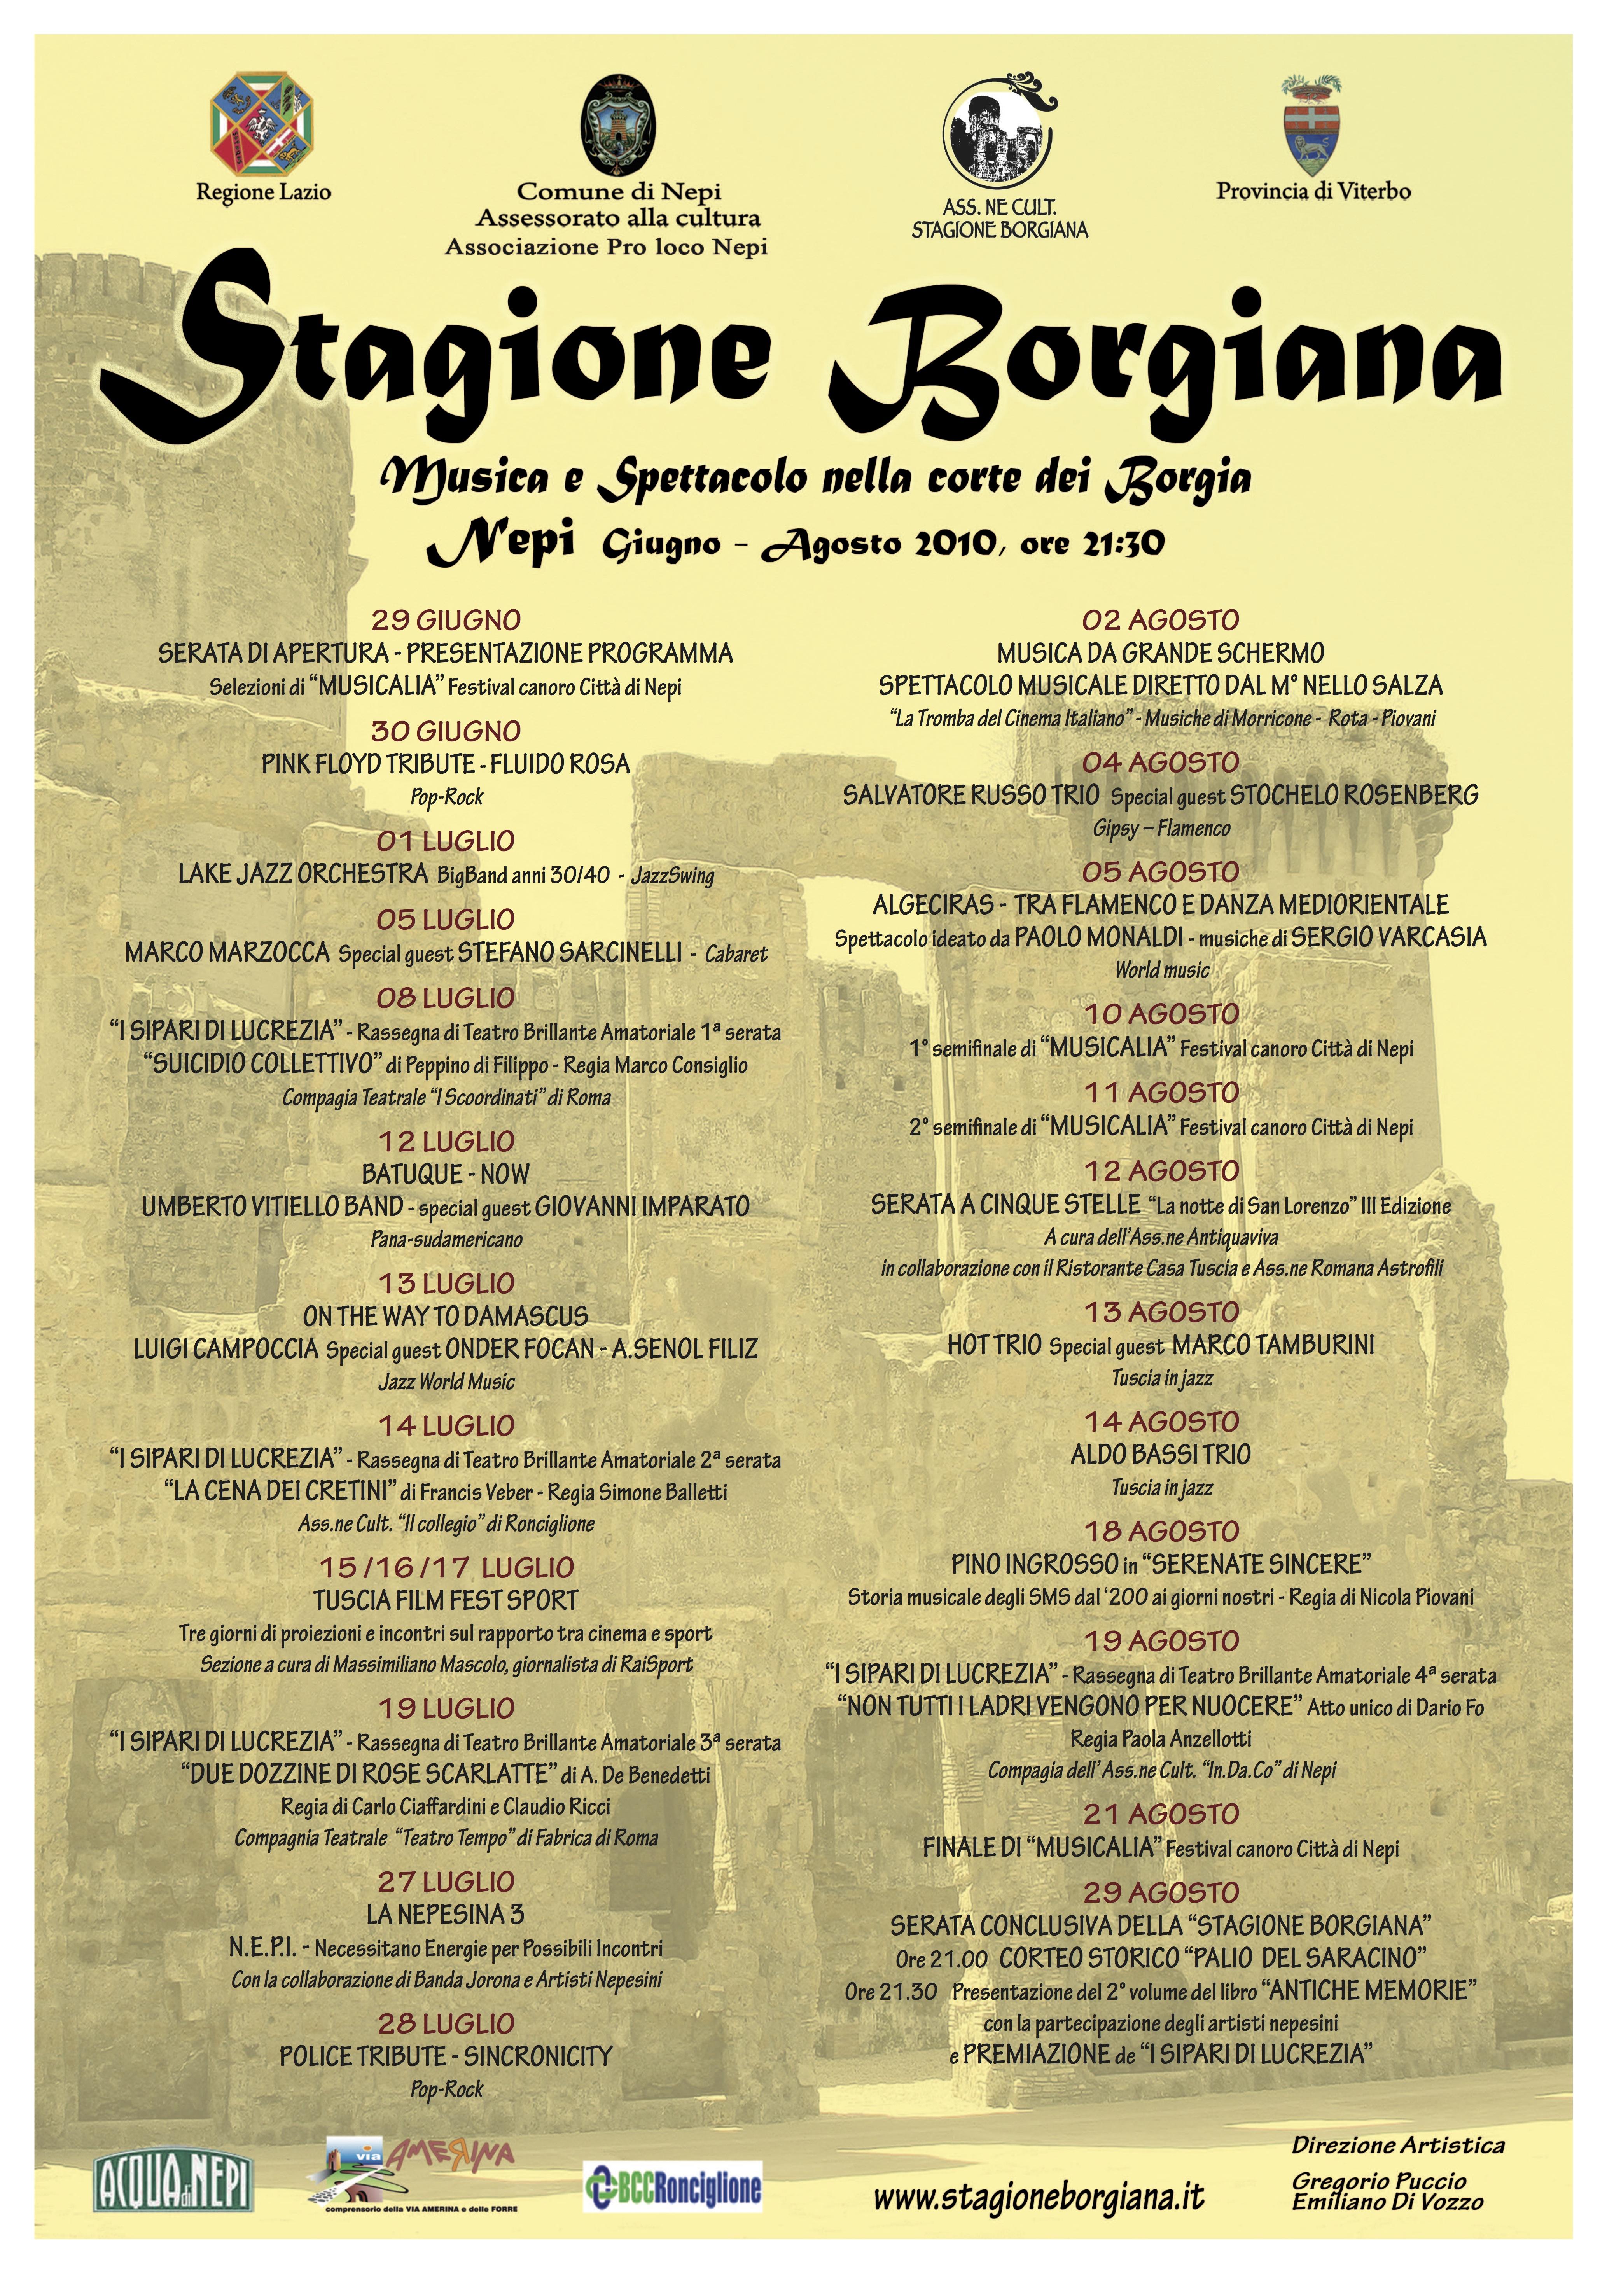 Stagione Borgiana 2010